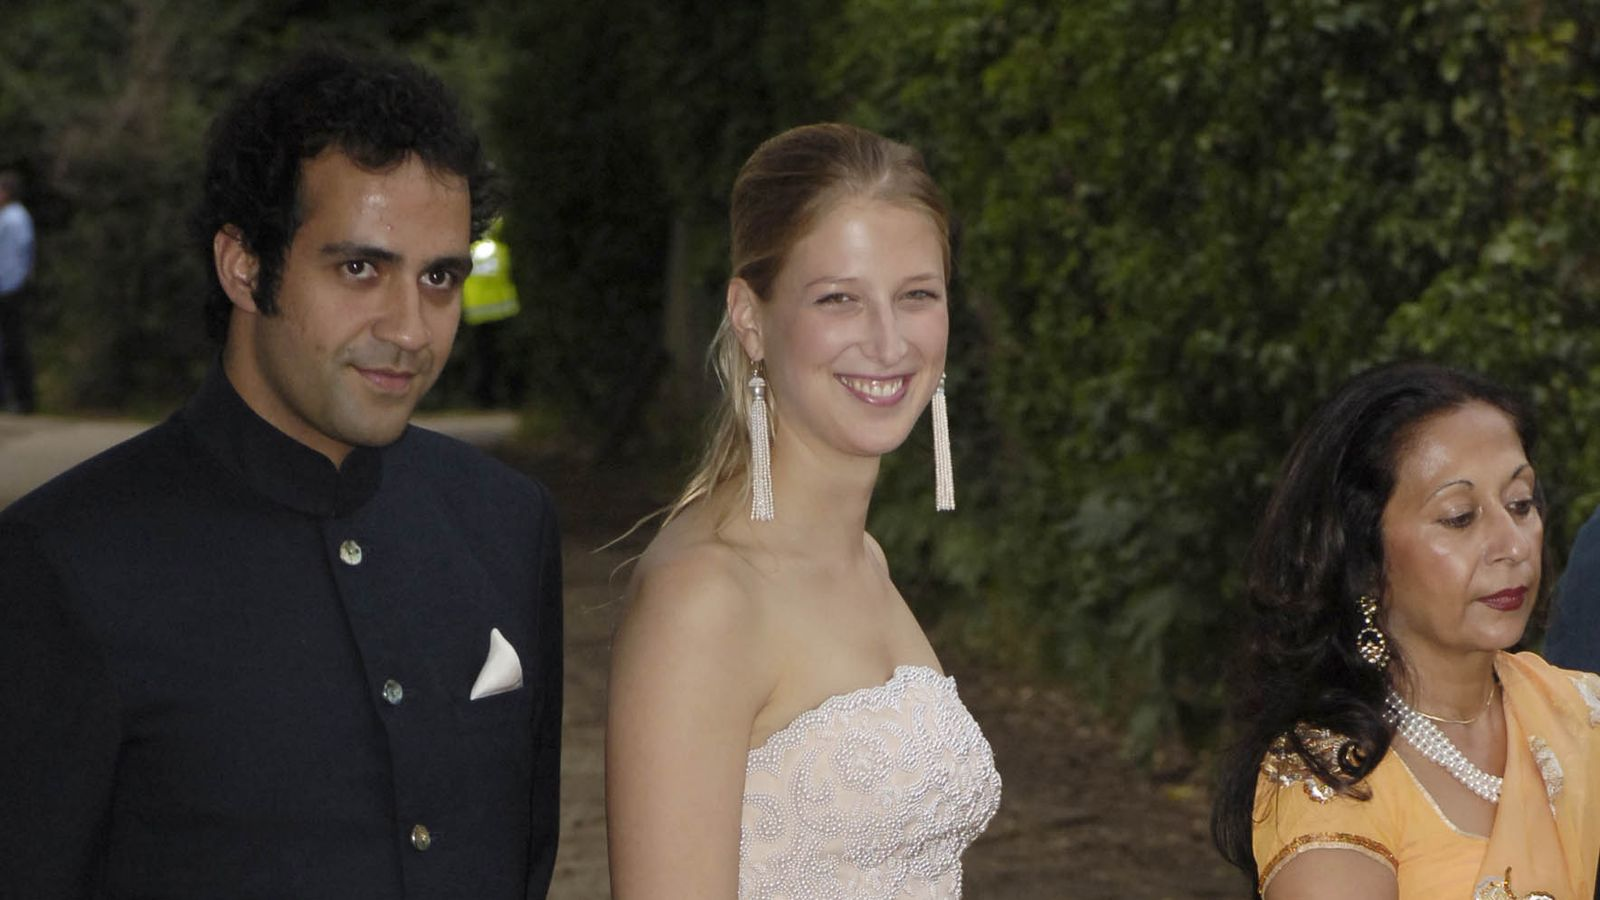 'Chilling message': India revokes British writer's citizenship